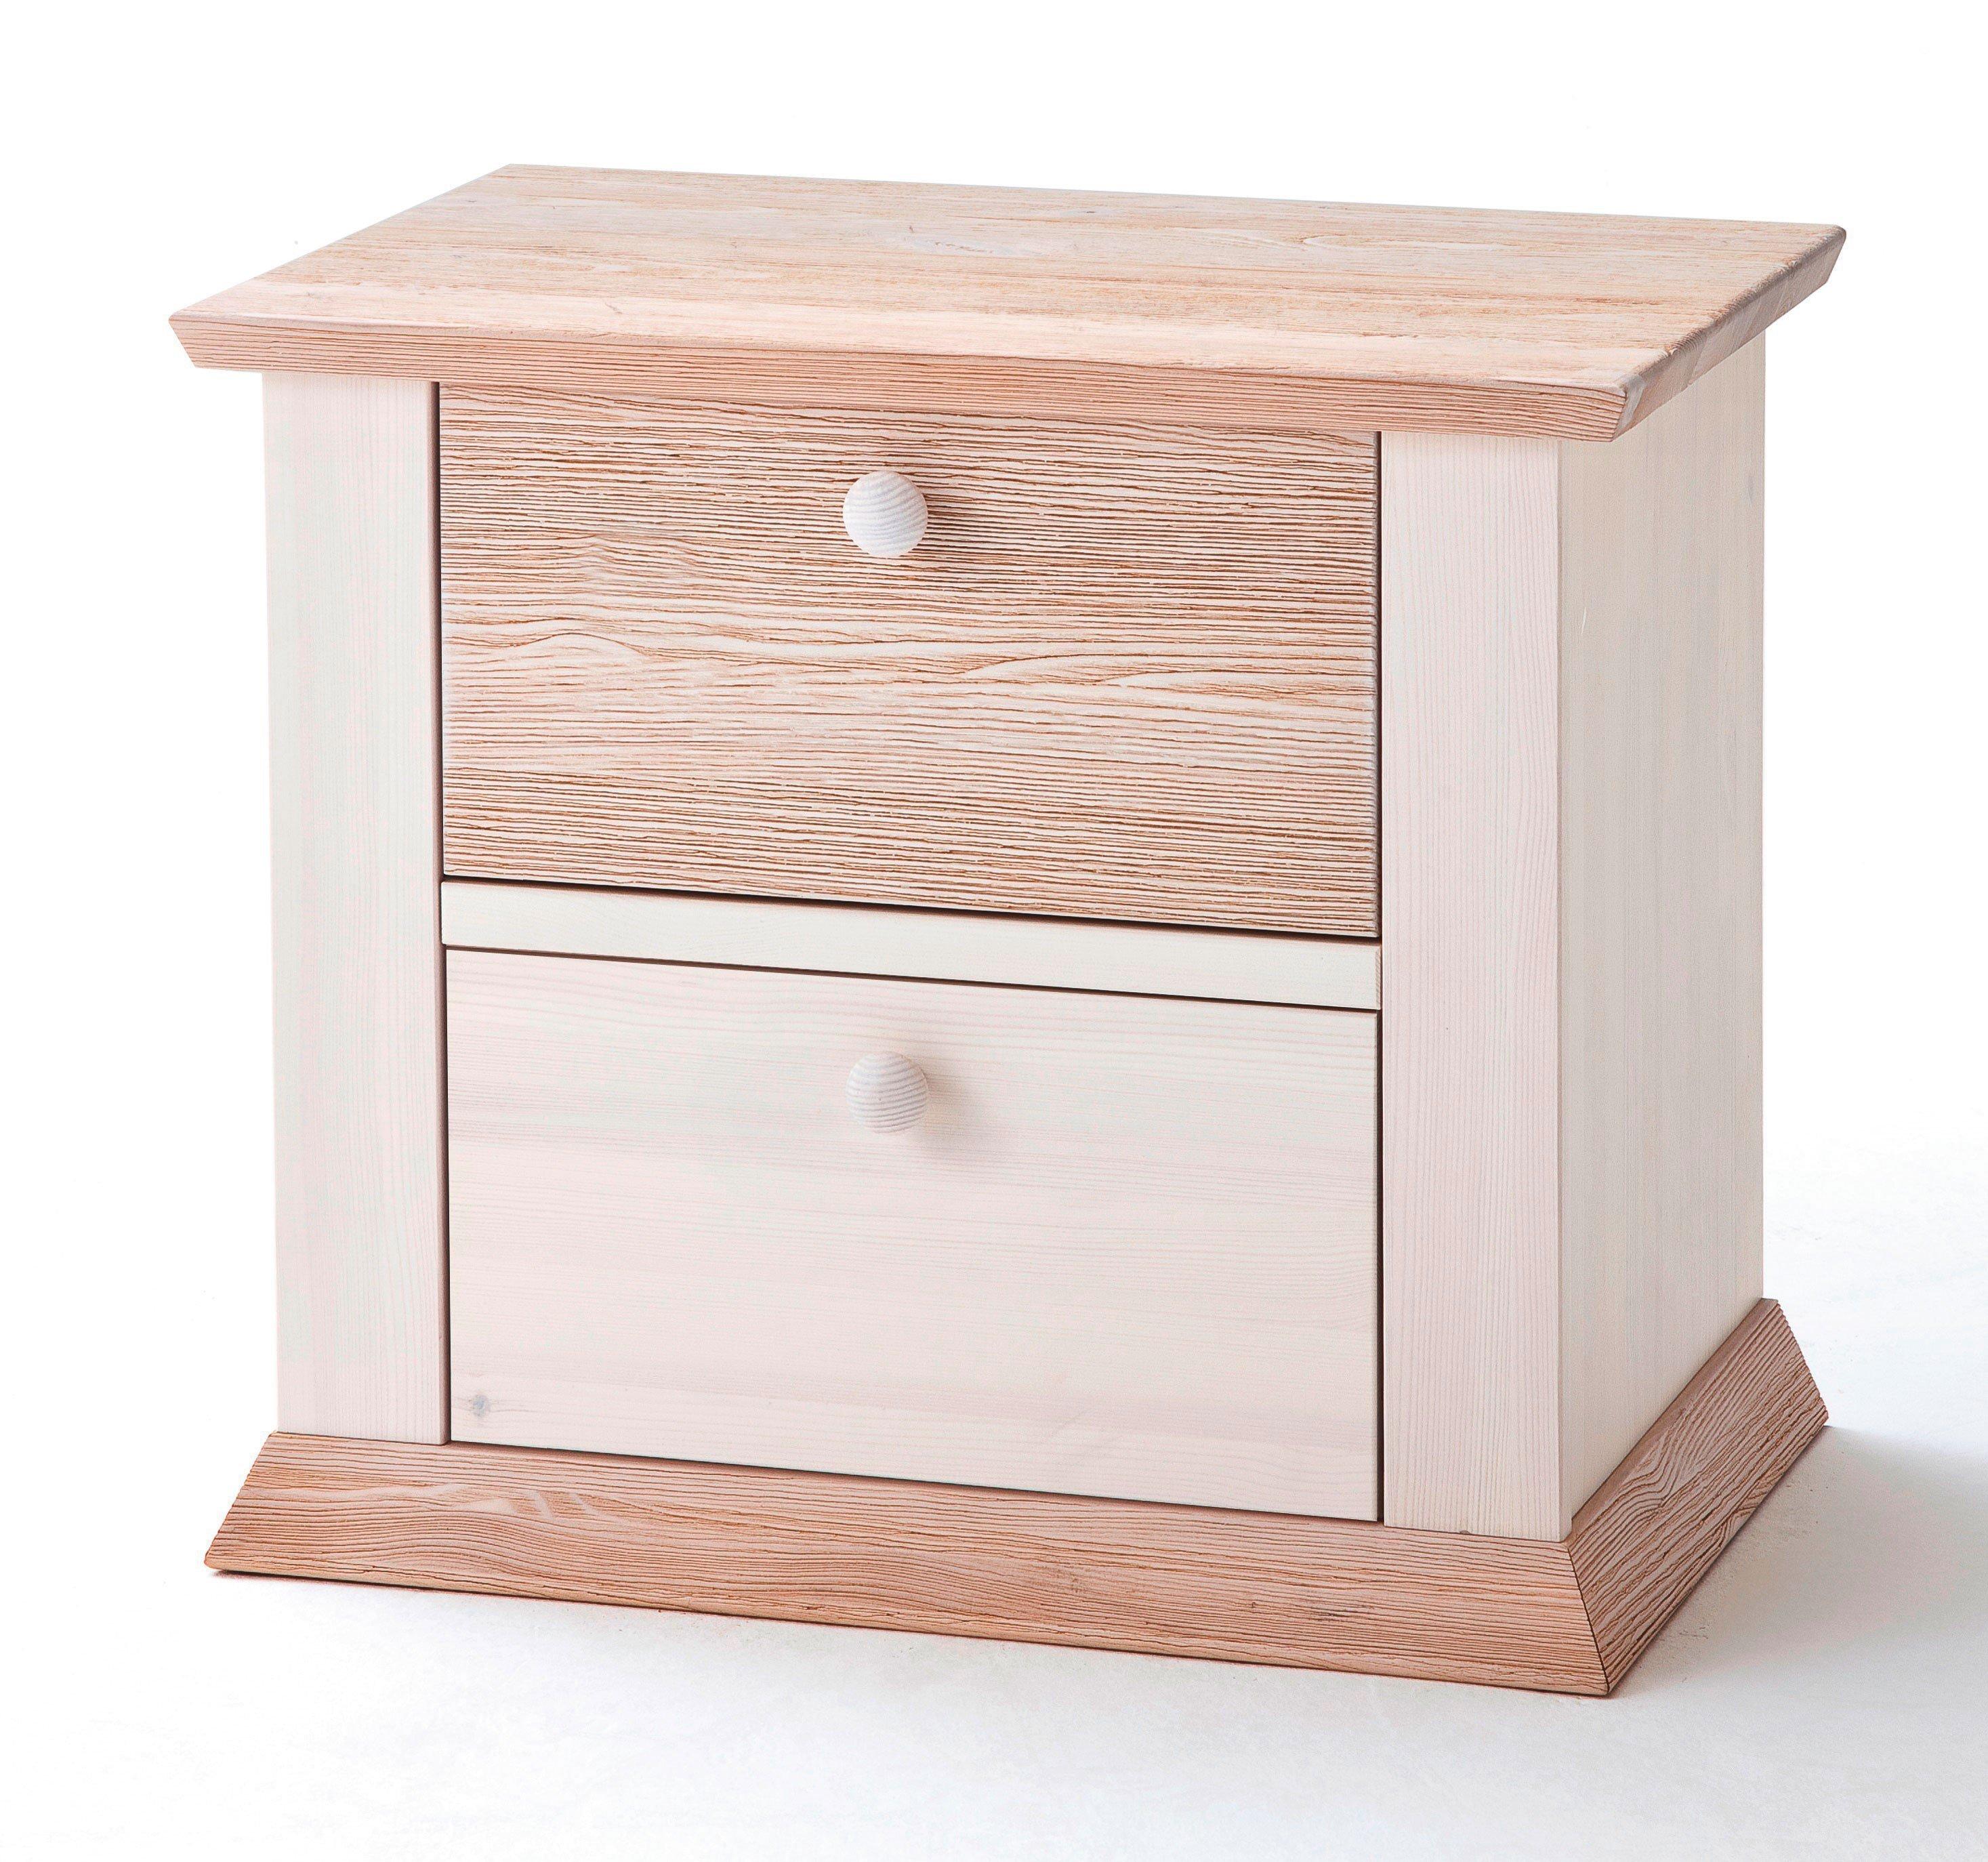 euro diffusion g teborg schrank kiefer m bel letz ihr online shop. Black Bedroom Furniture Sets. Home Design Ideas